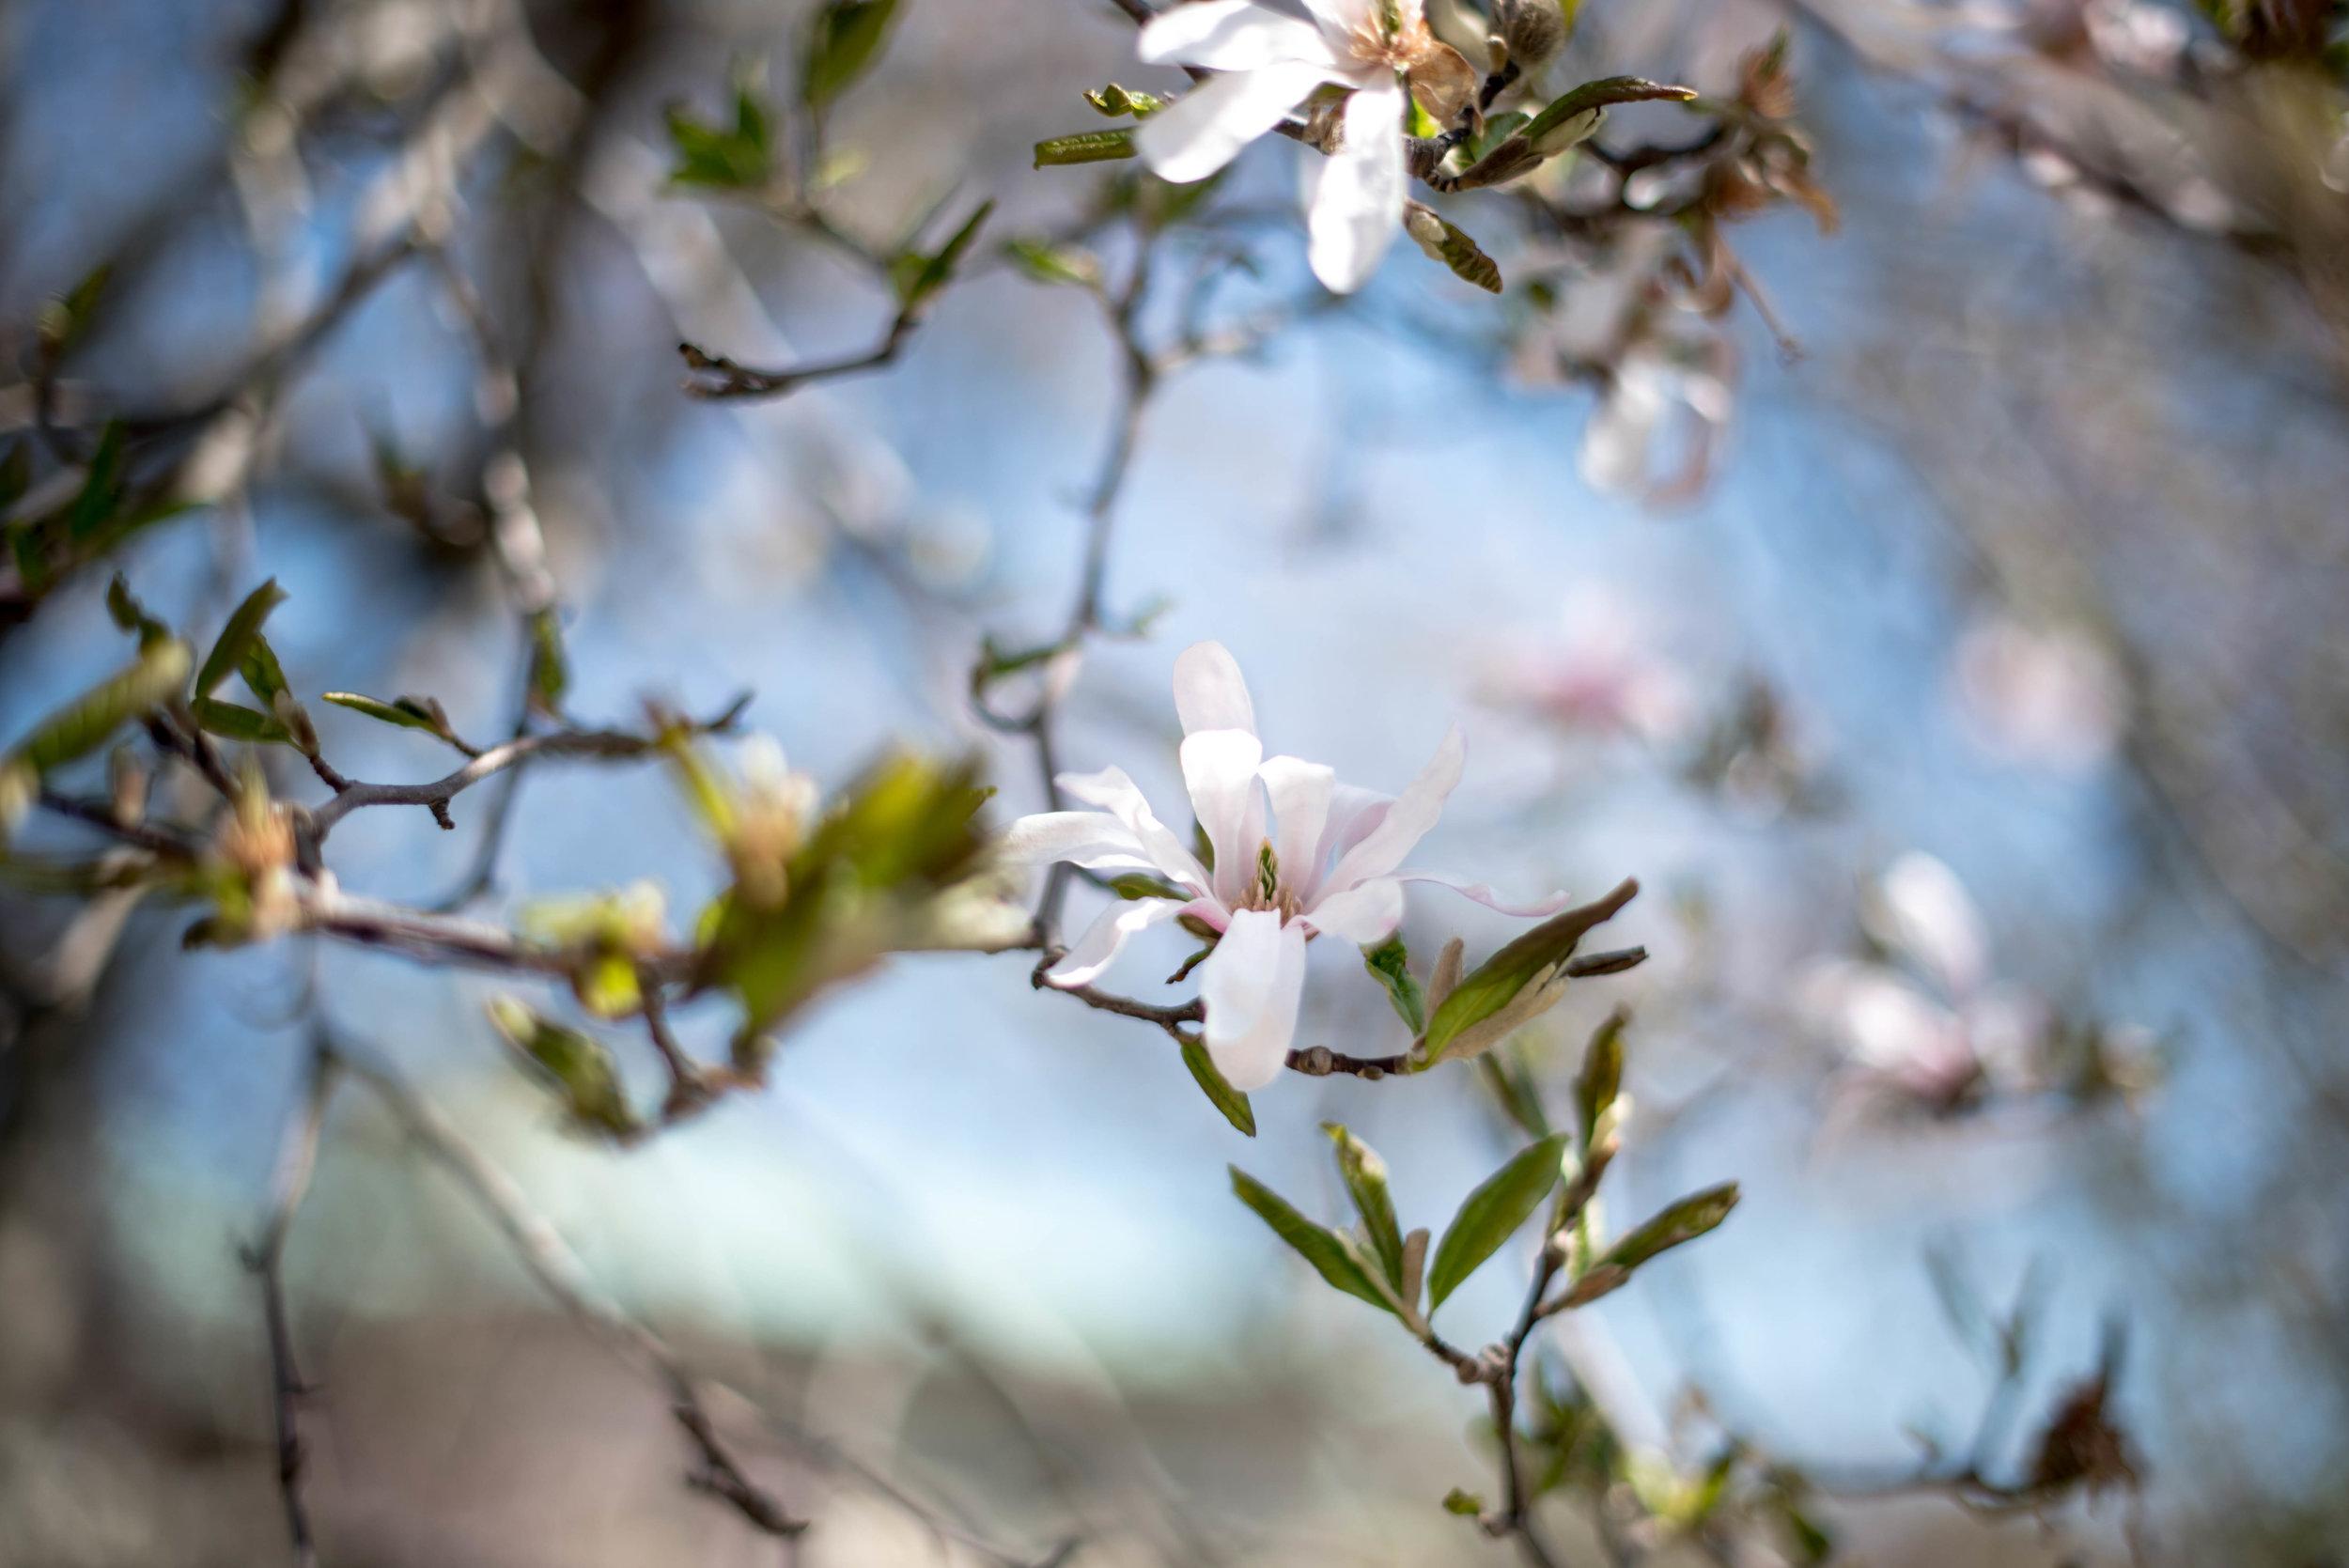 ROSE & IVY Journal Floating Magnolias